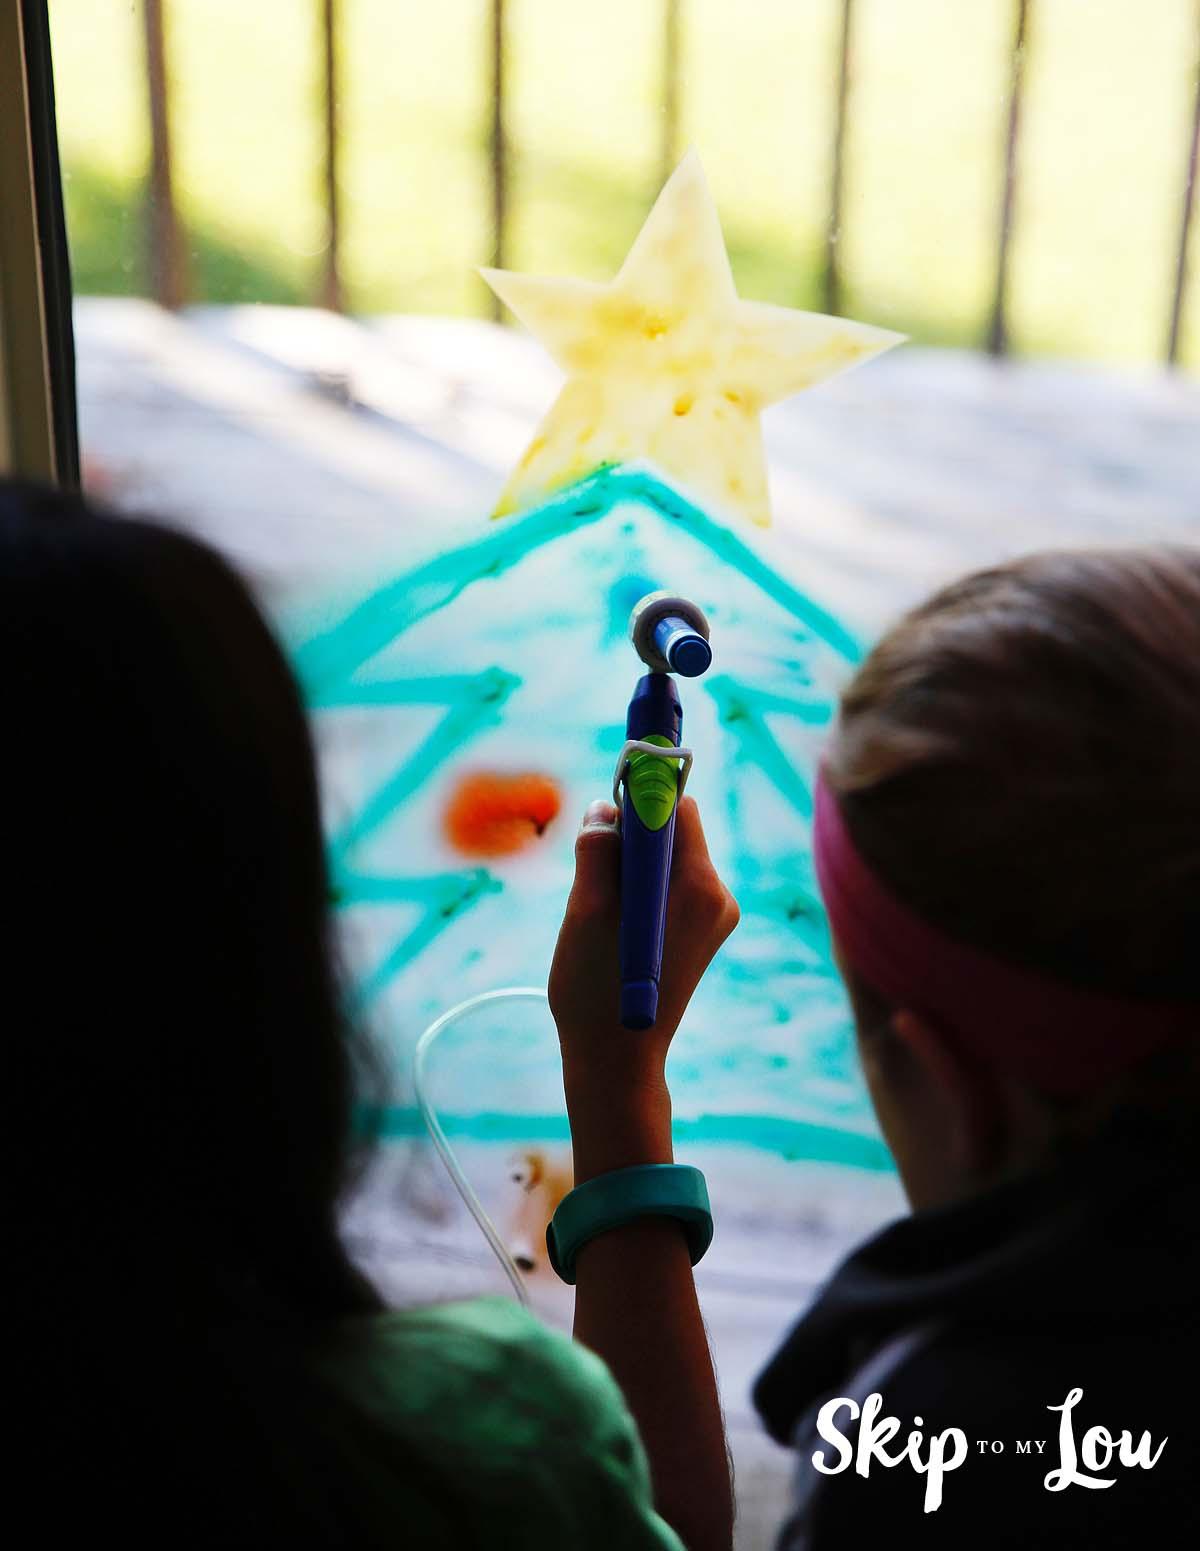 Crayola Air Marker Sprayer Review Skip To